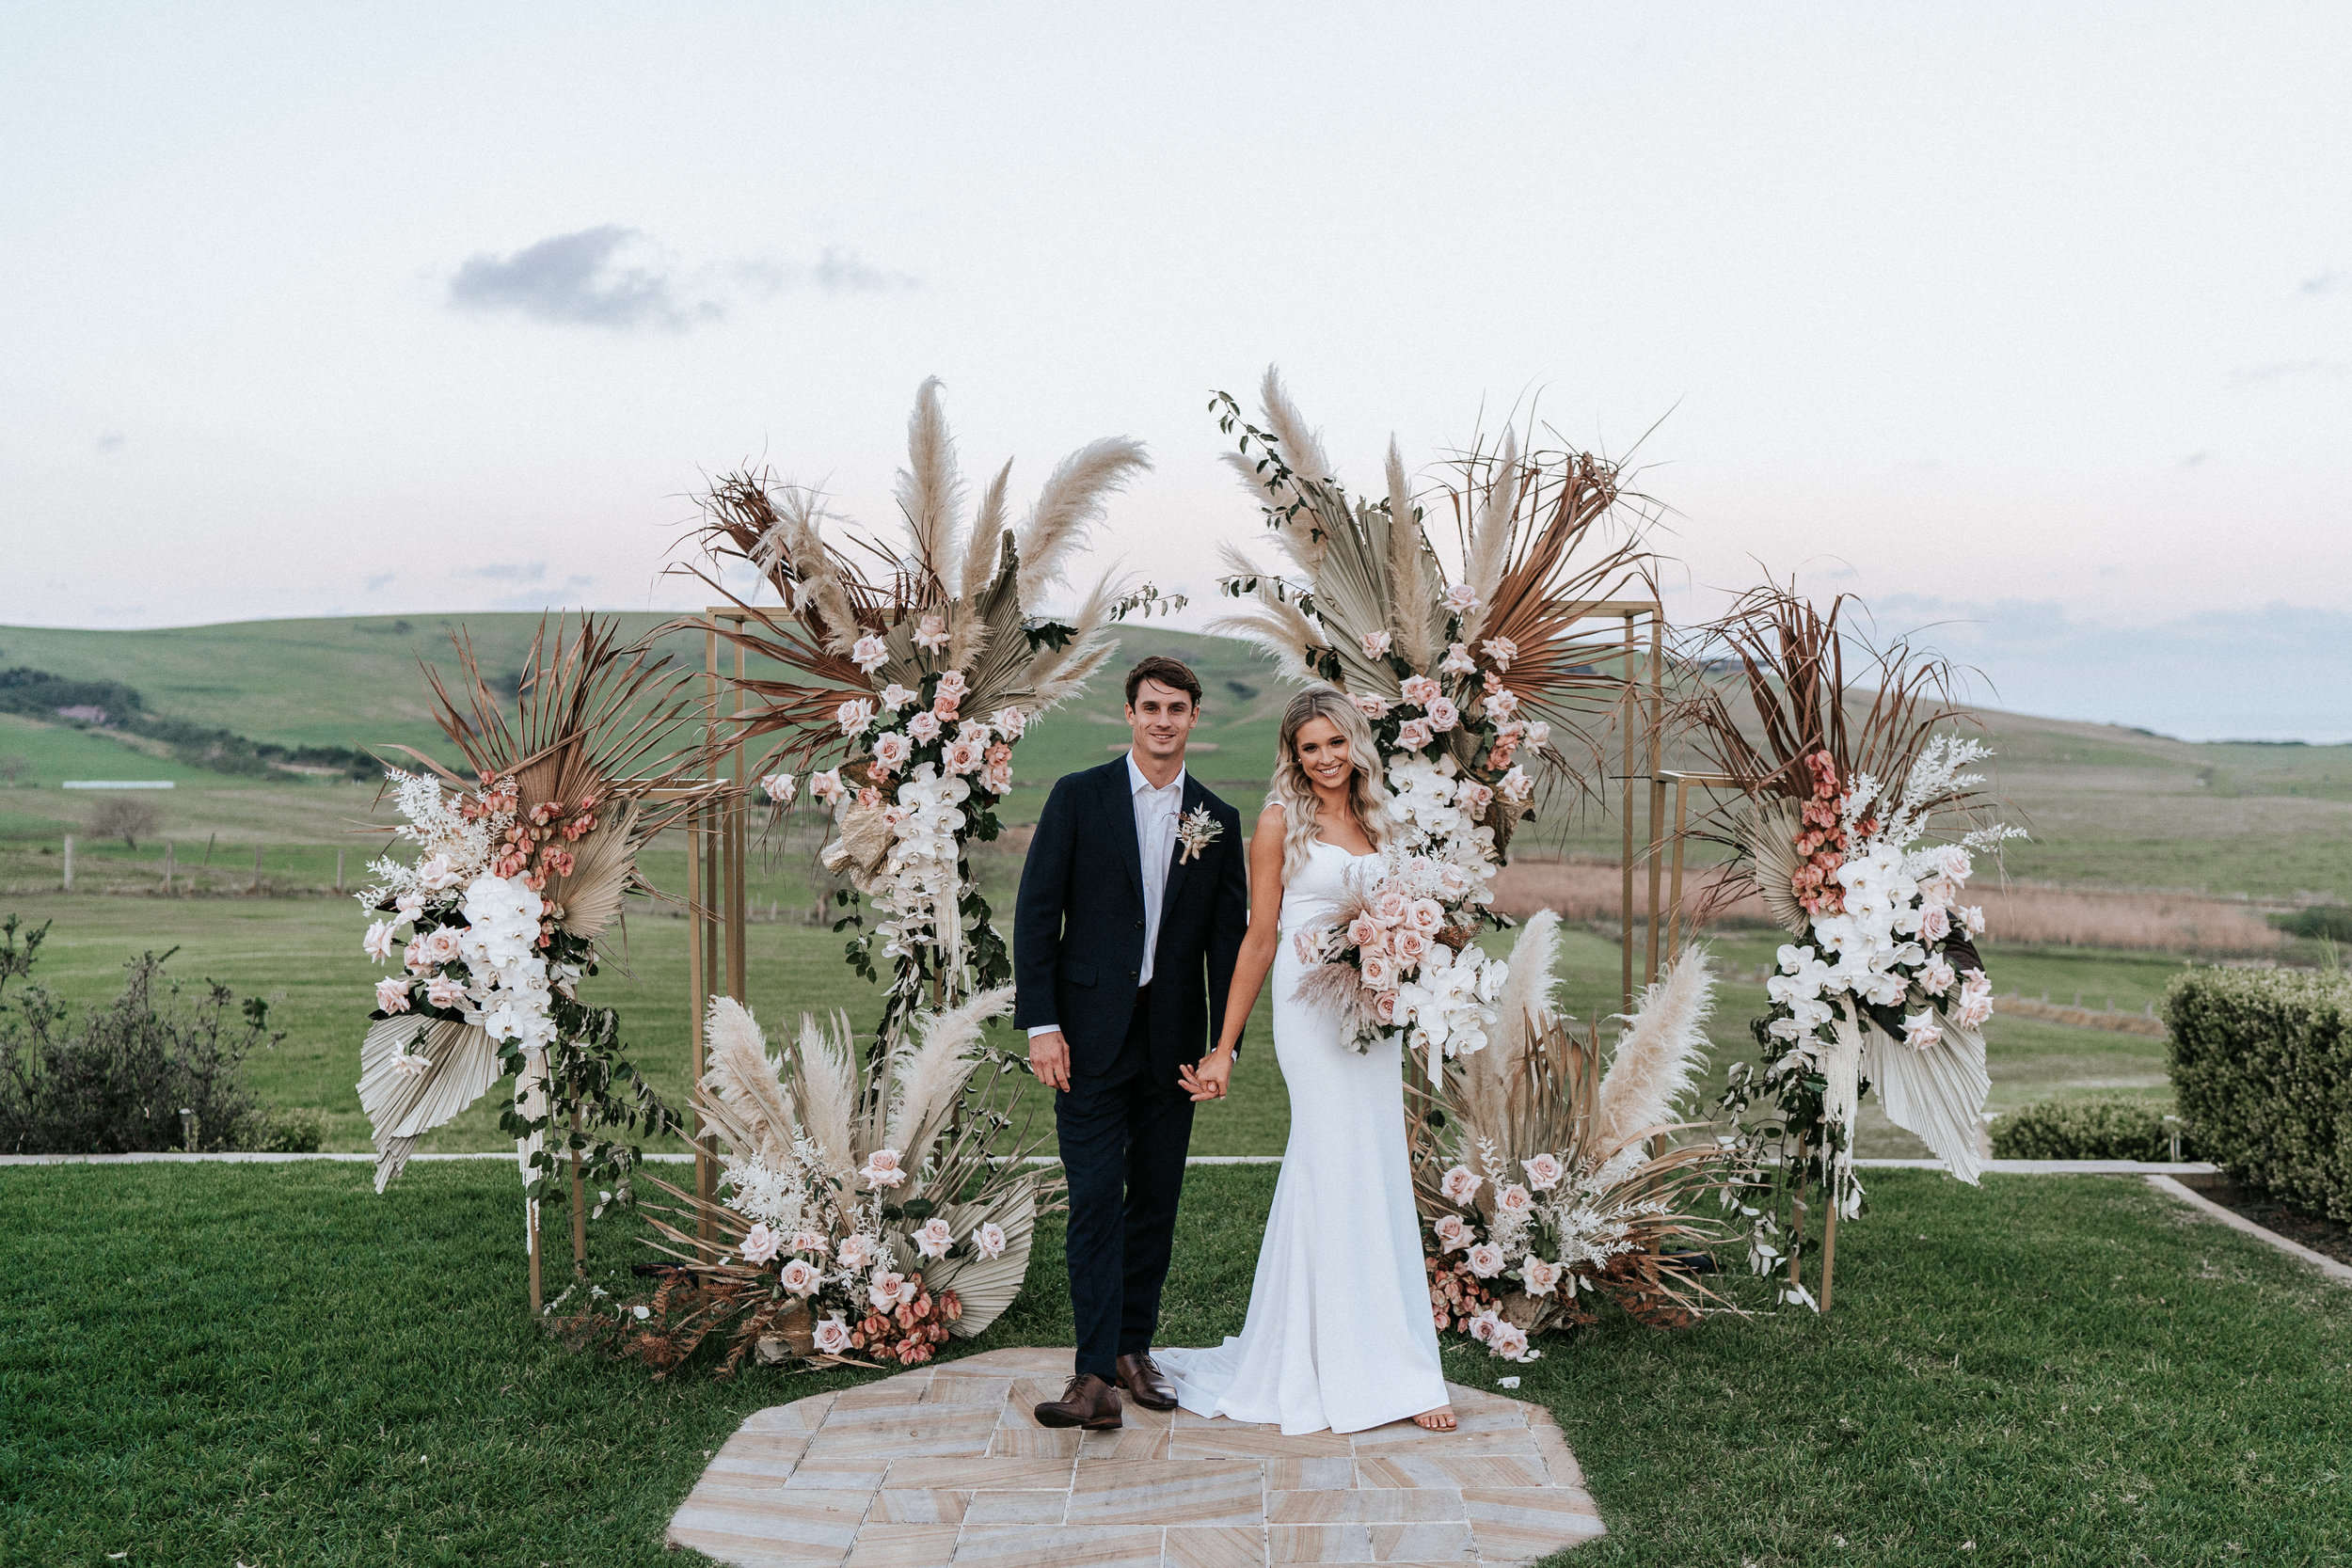 gemaya-tim-bilmon-wedding-823.jpg